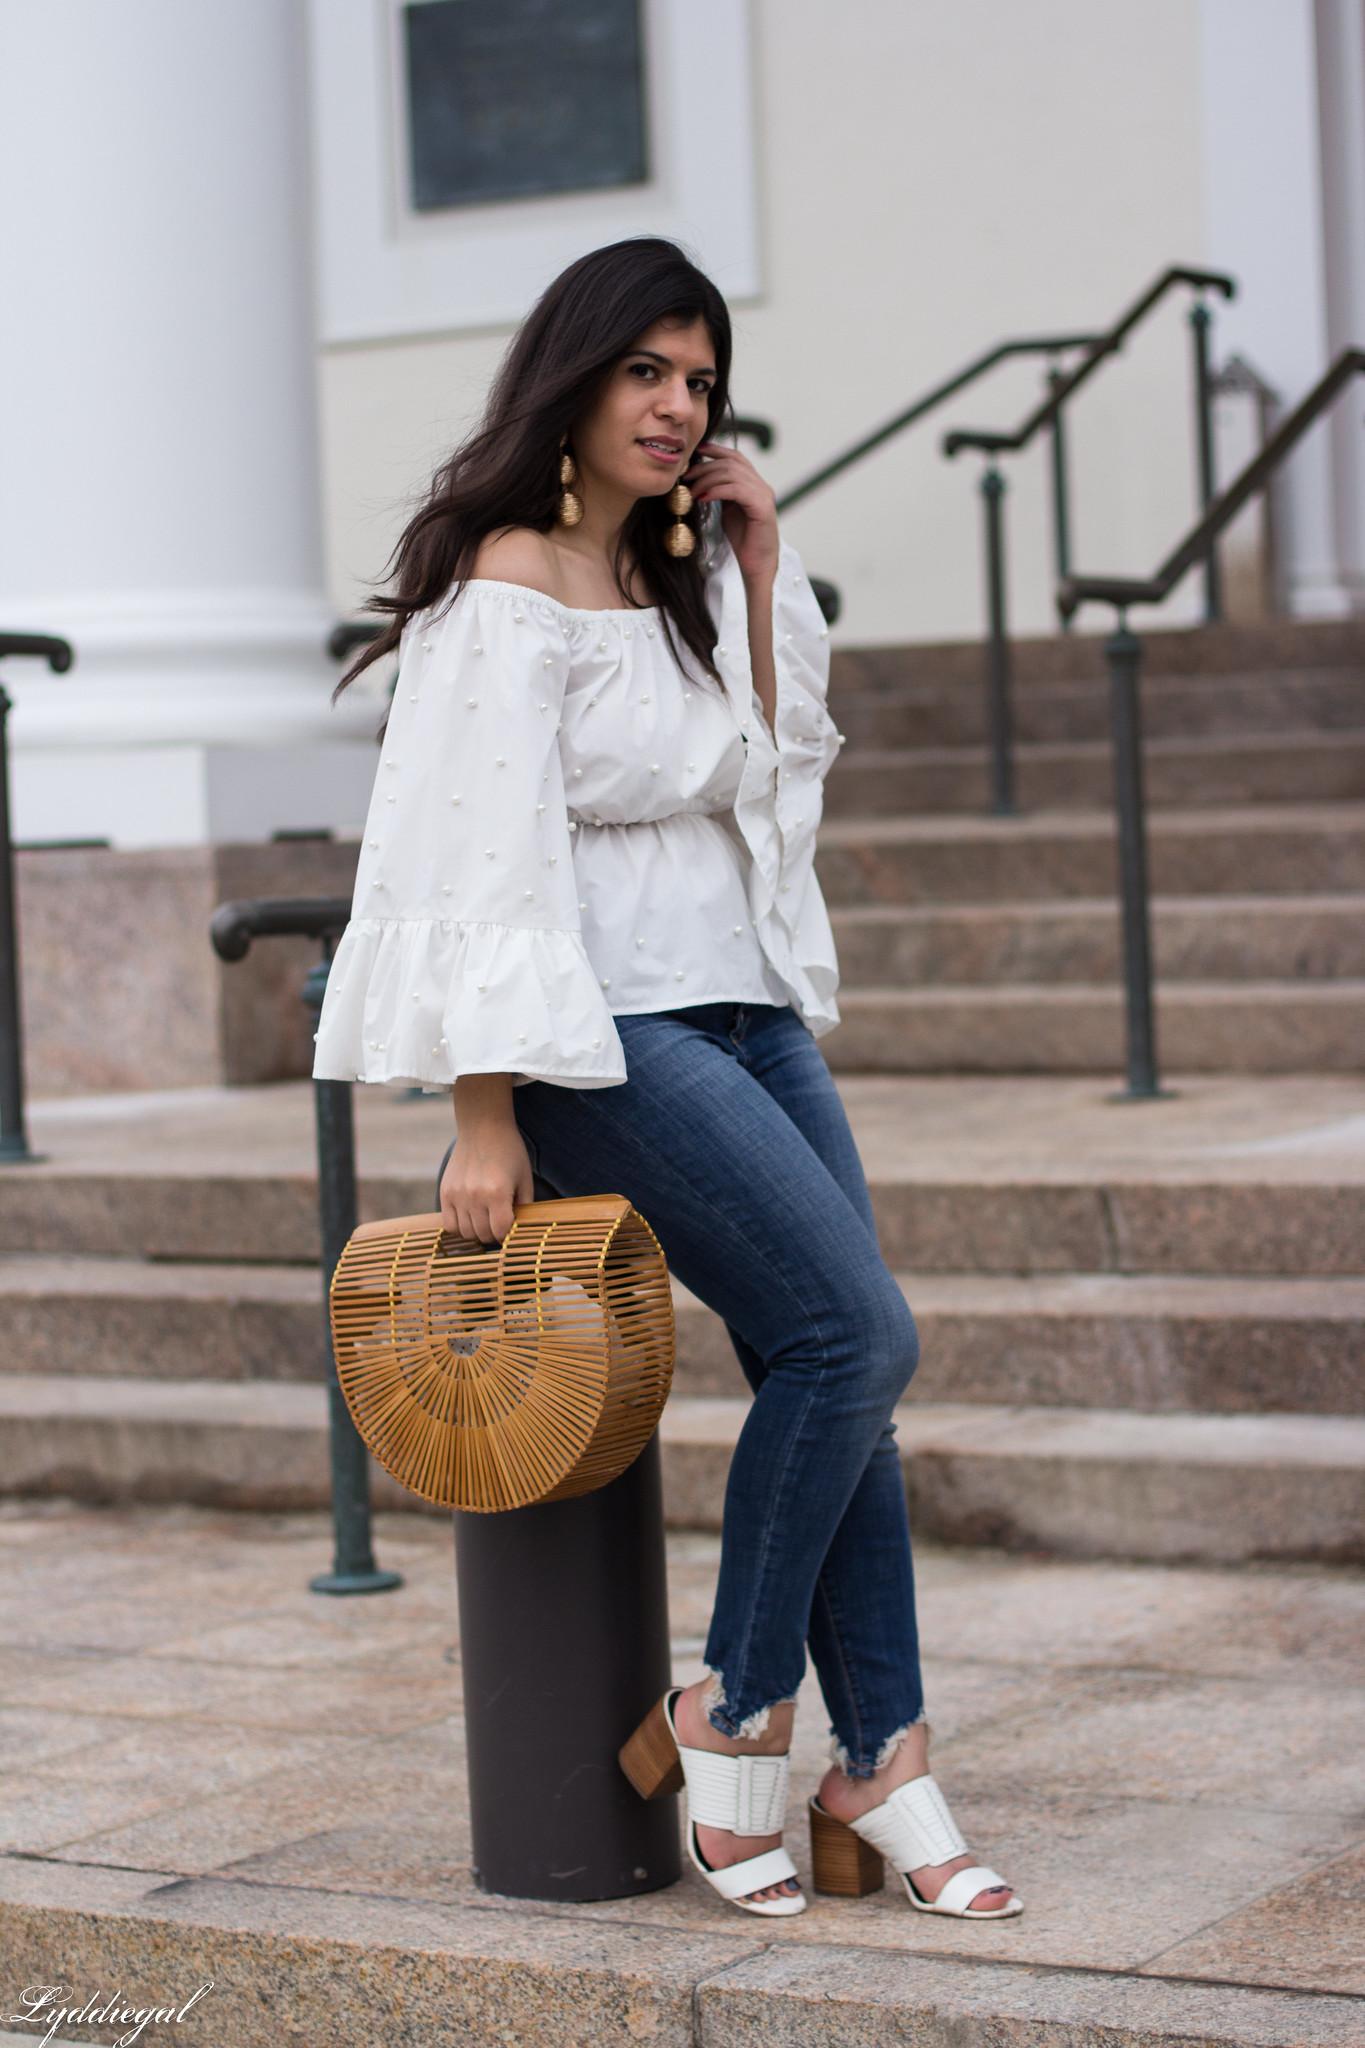 off the shoulder pearl embelleshed blouse, distressed denim, bamboo purse-8.jpg